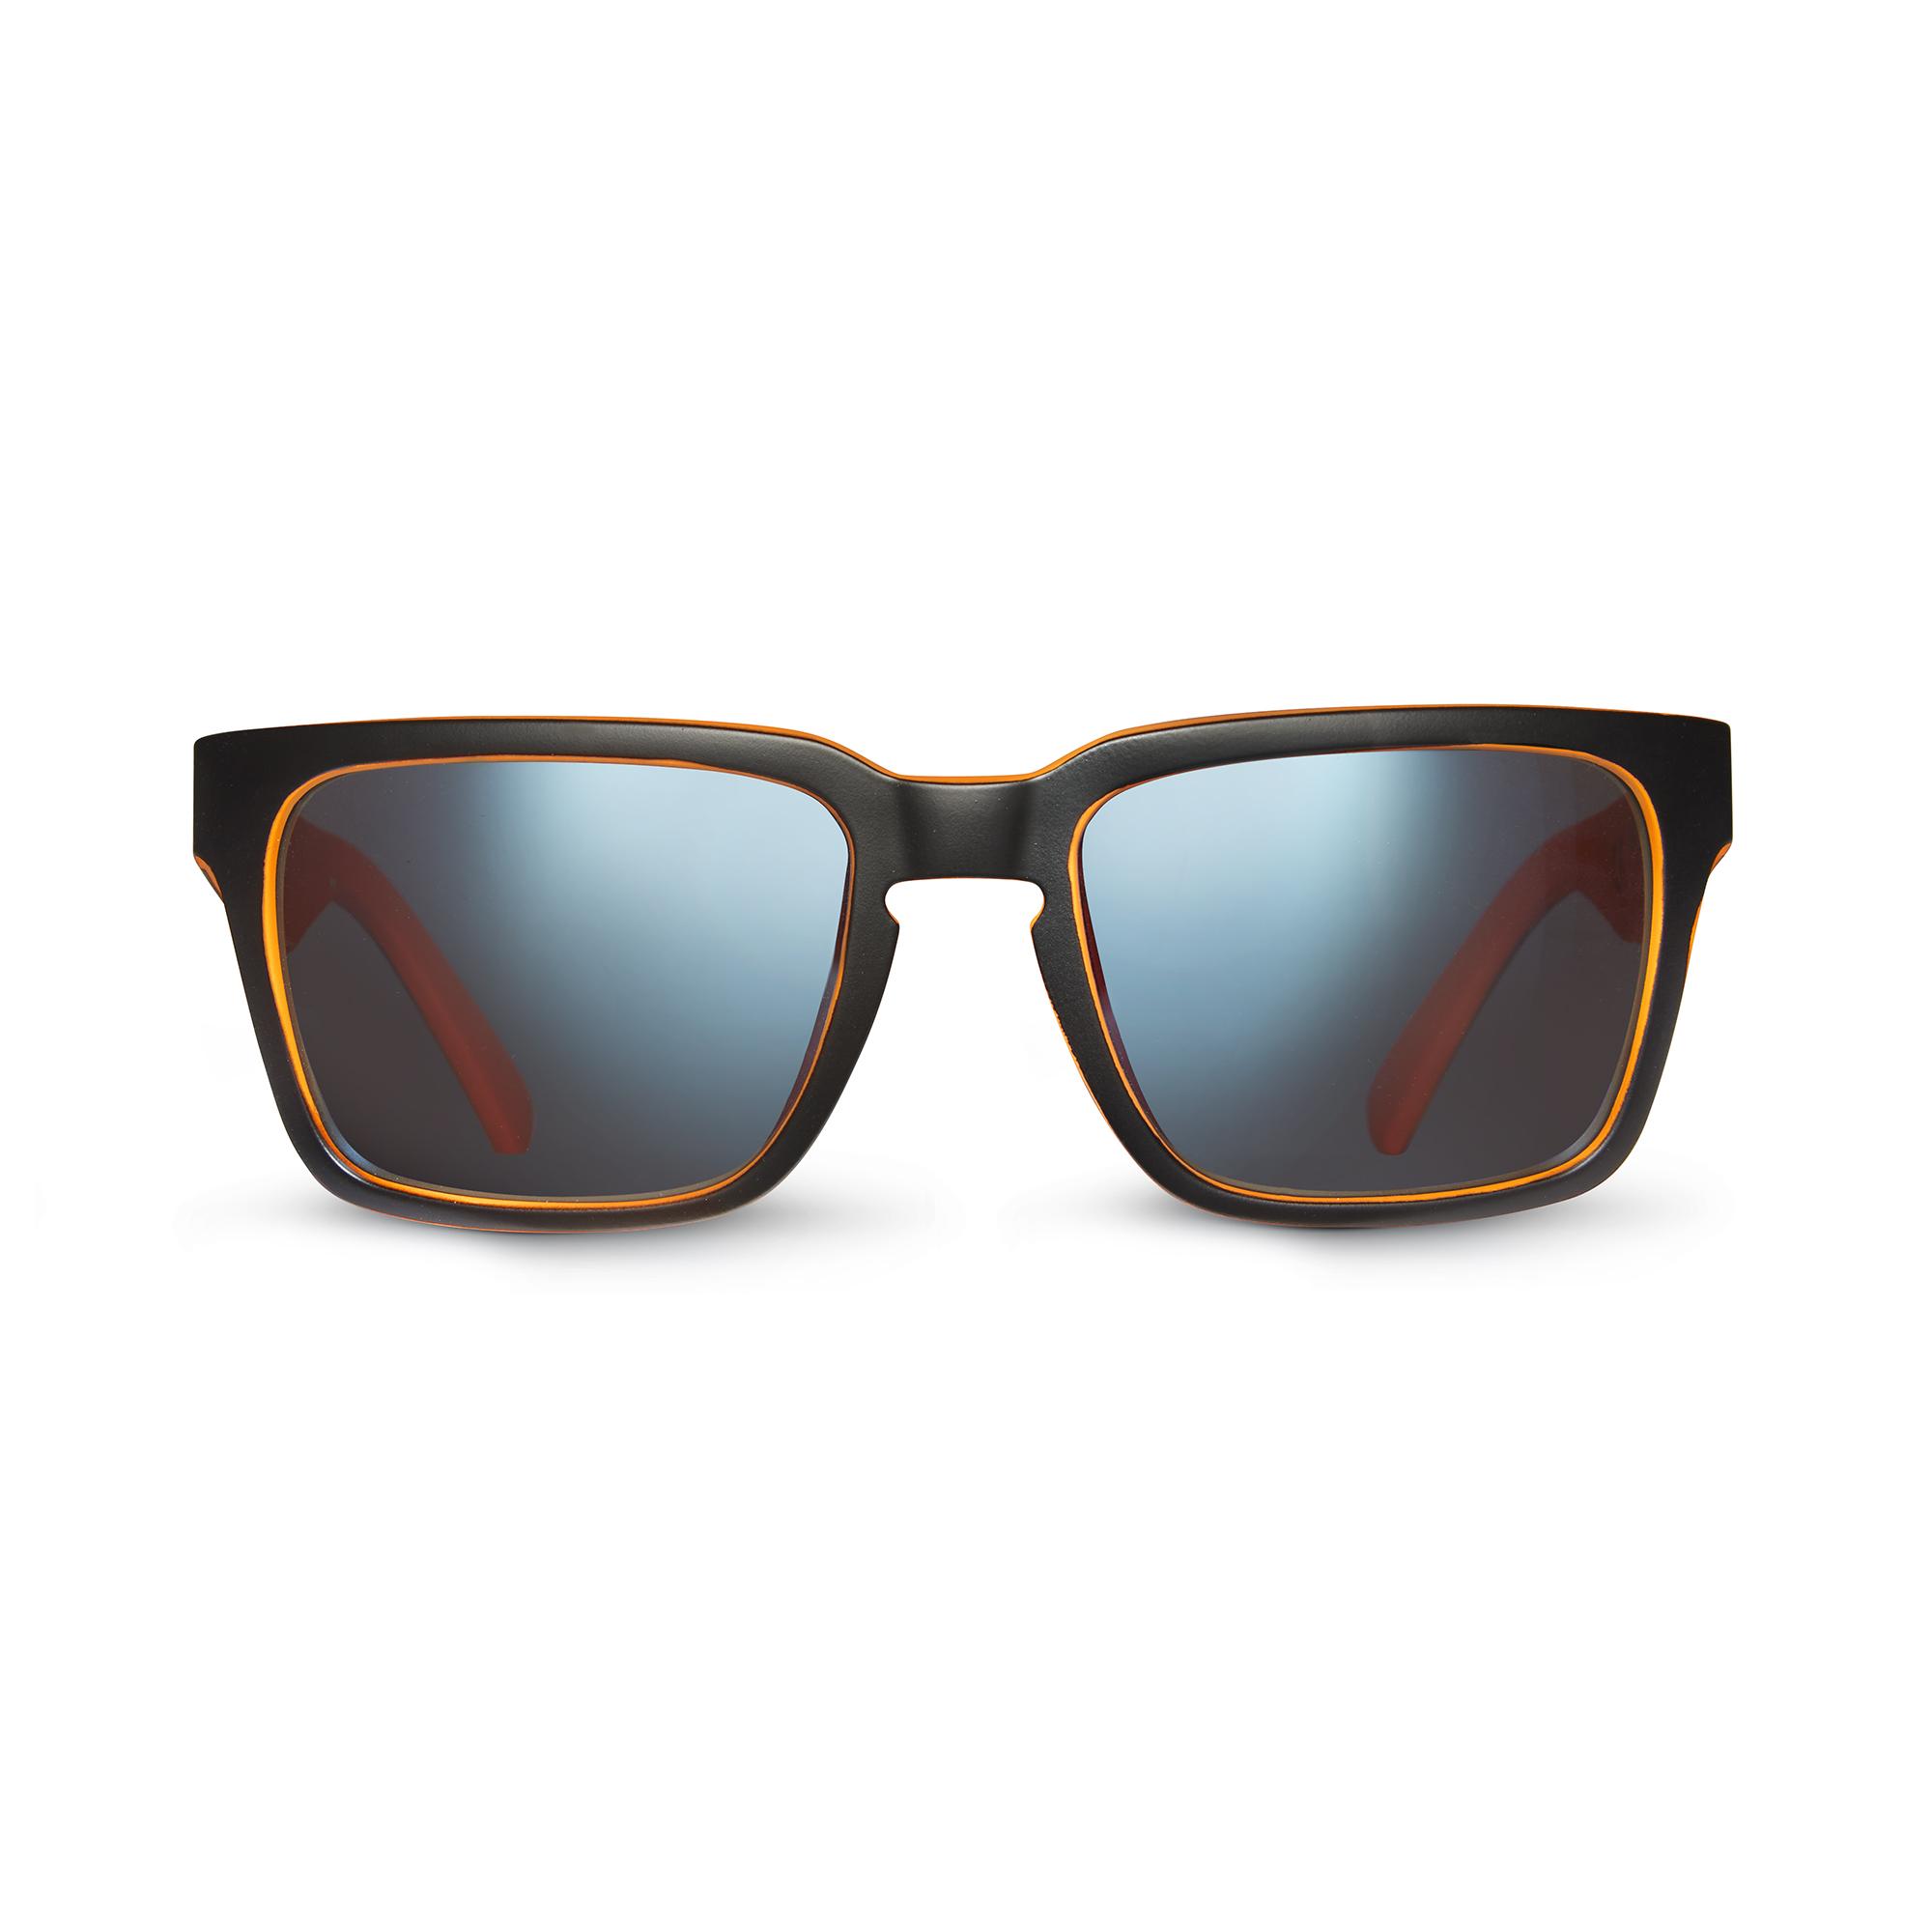 Experimental Edition Evolution FLT Sunglasses - Front